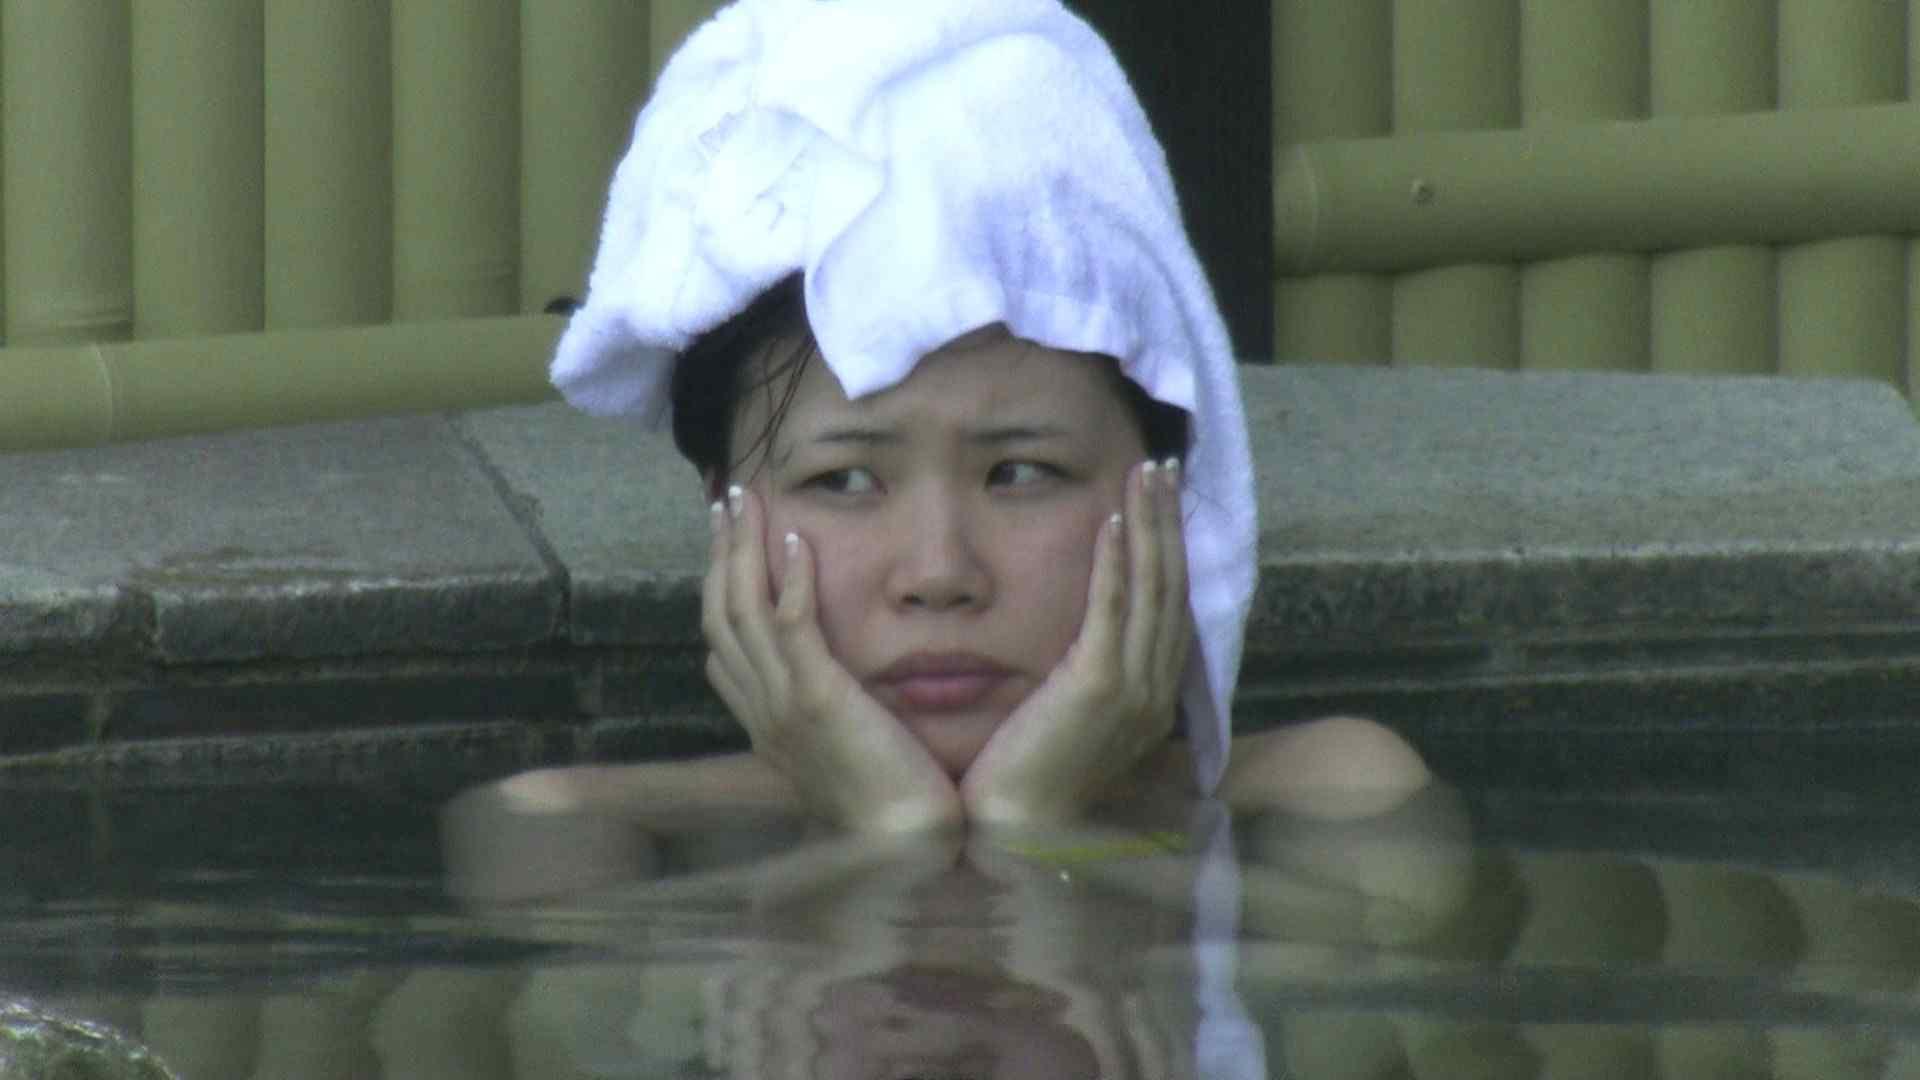 Aquaな露天風呂Vol.183 盗撮 | OLセックス  69画像 67